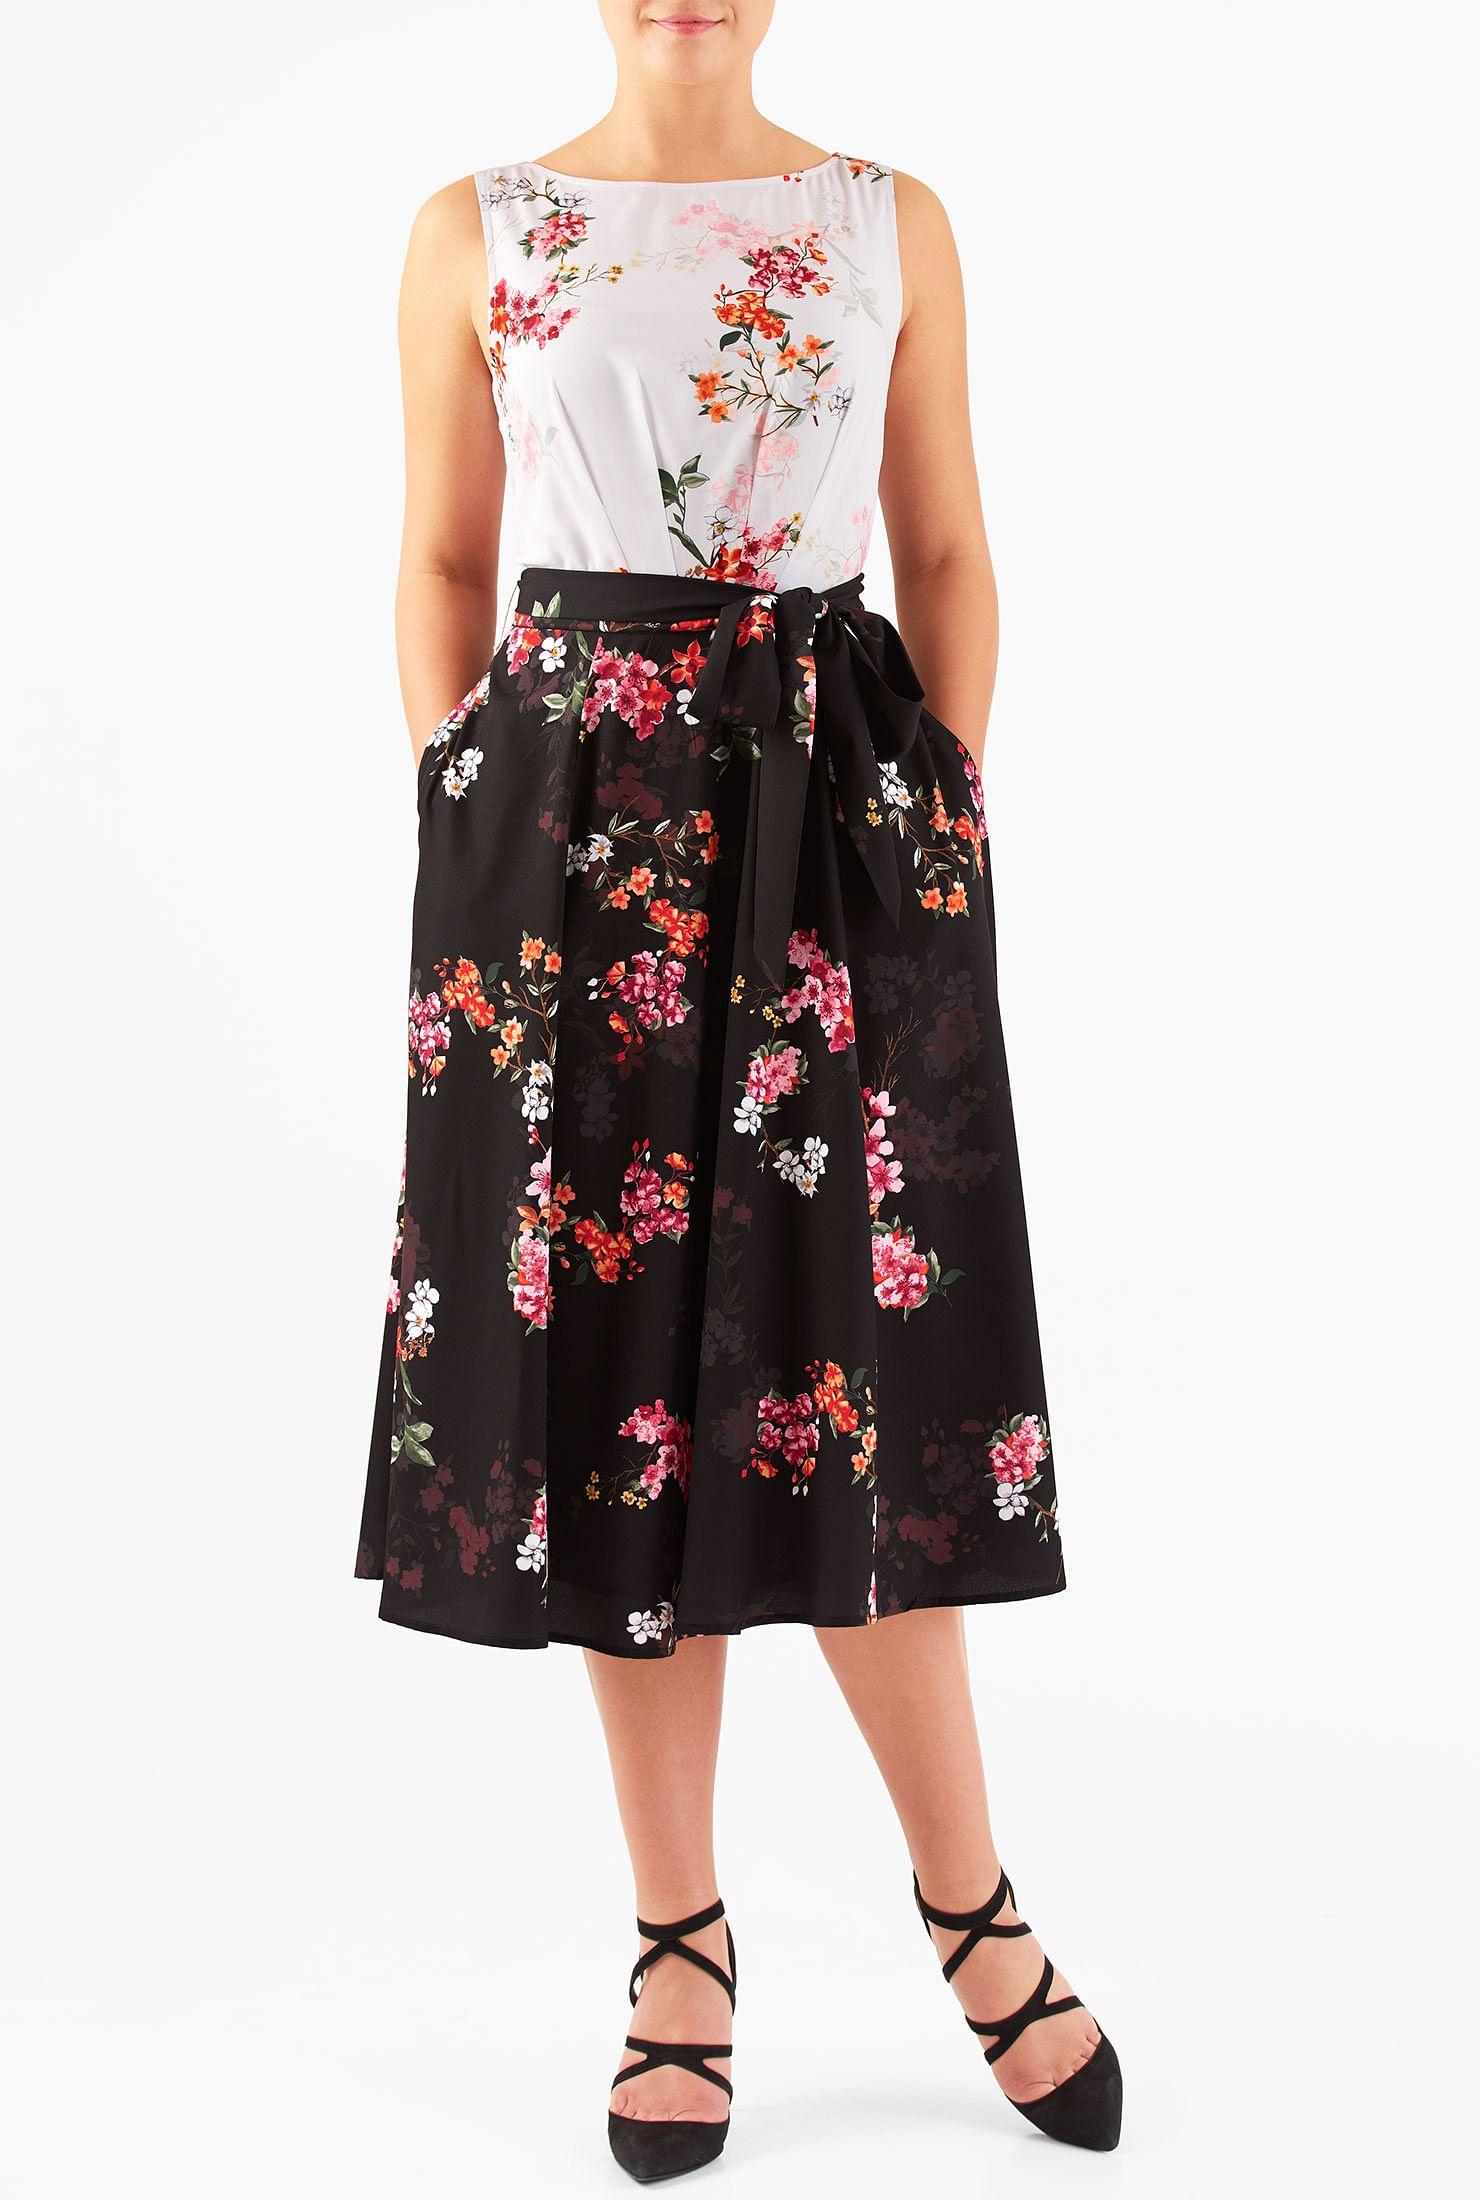 Custom dresses online womens clothing tops at eshakti contrast tone floral print crepe midi dress ombrellifo Choice Image